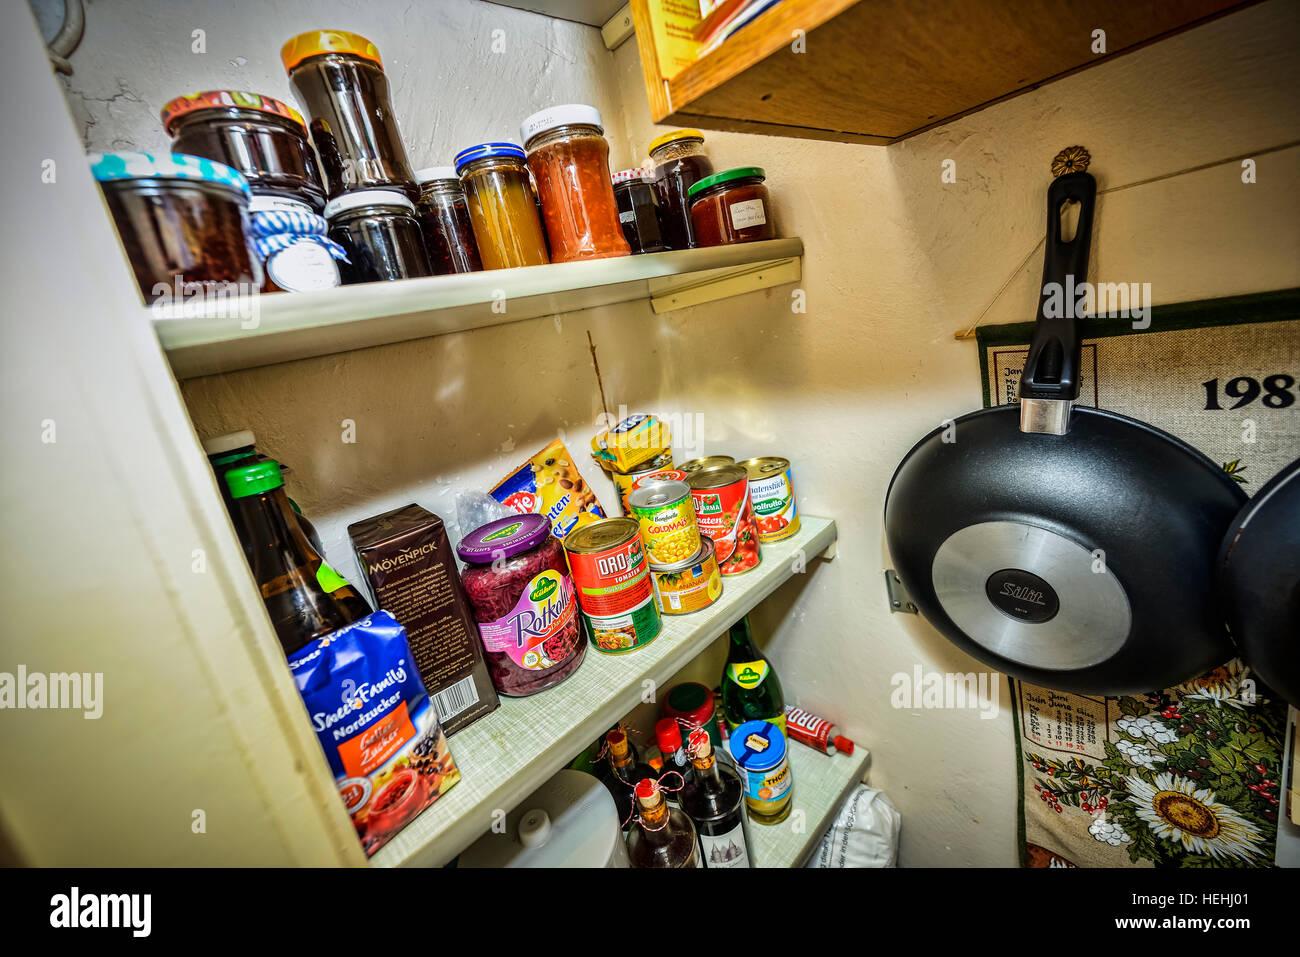 Speisekammer mit Konservendosen und Einmachglaesern Stock Photo